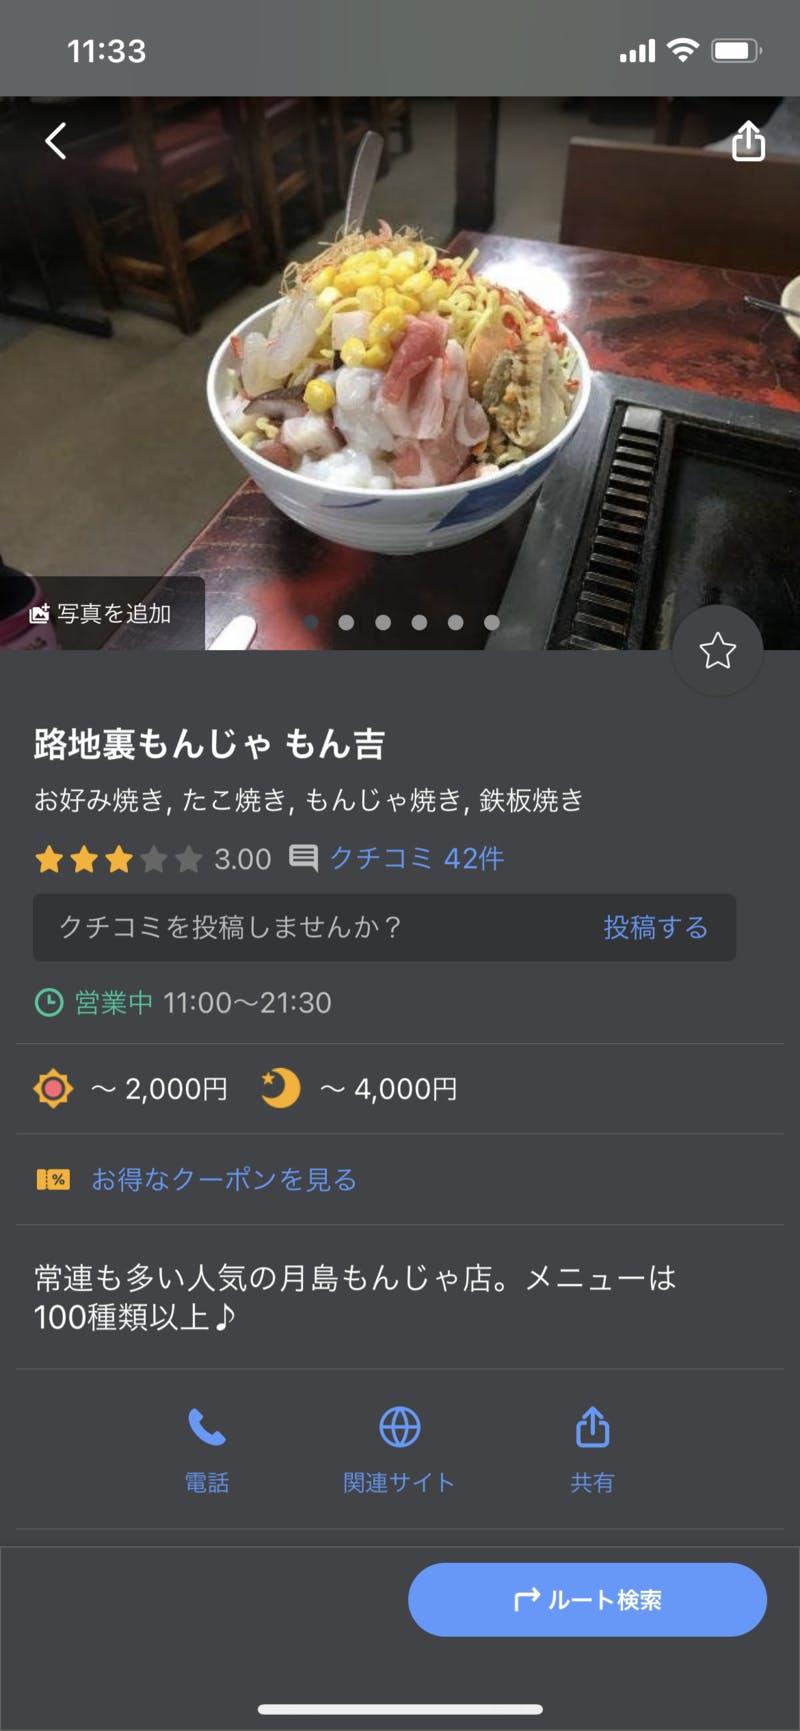 Yahoo!マップ 使い方